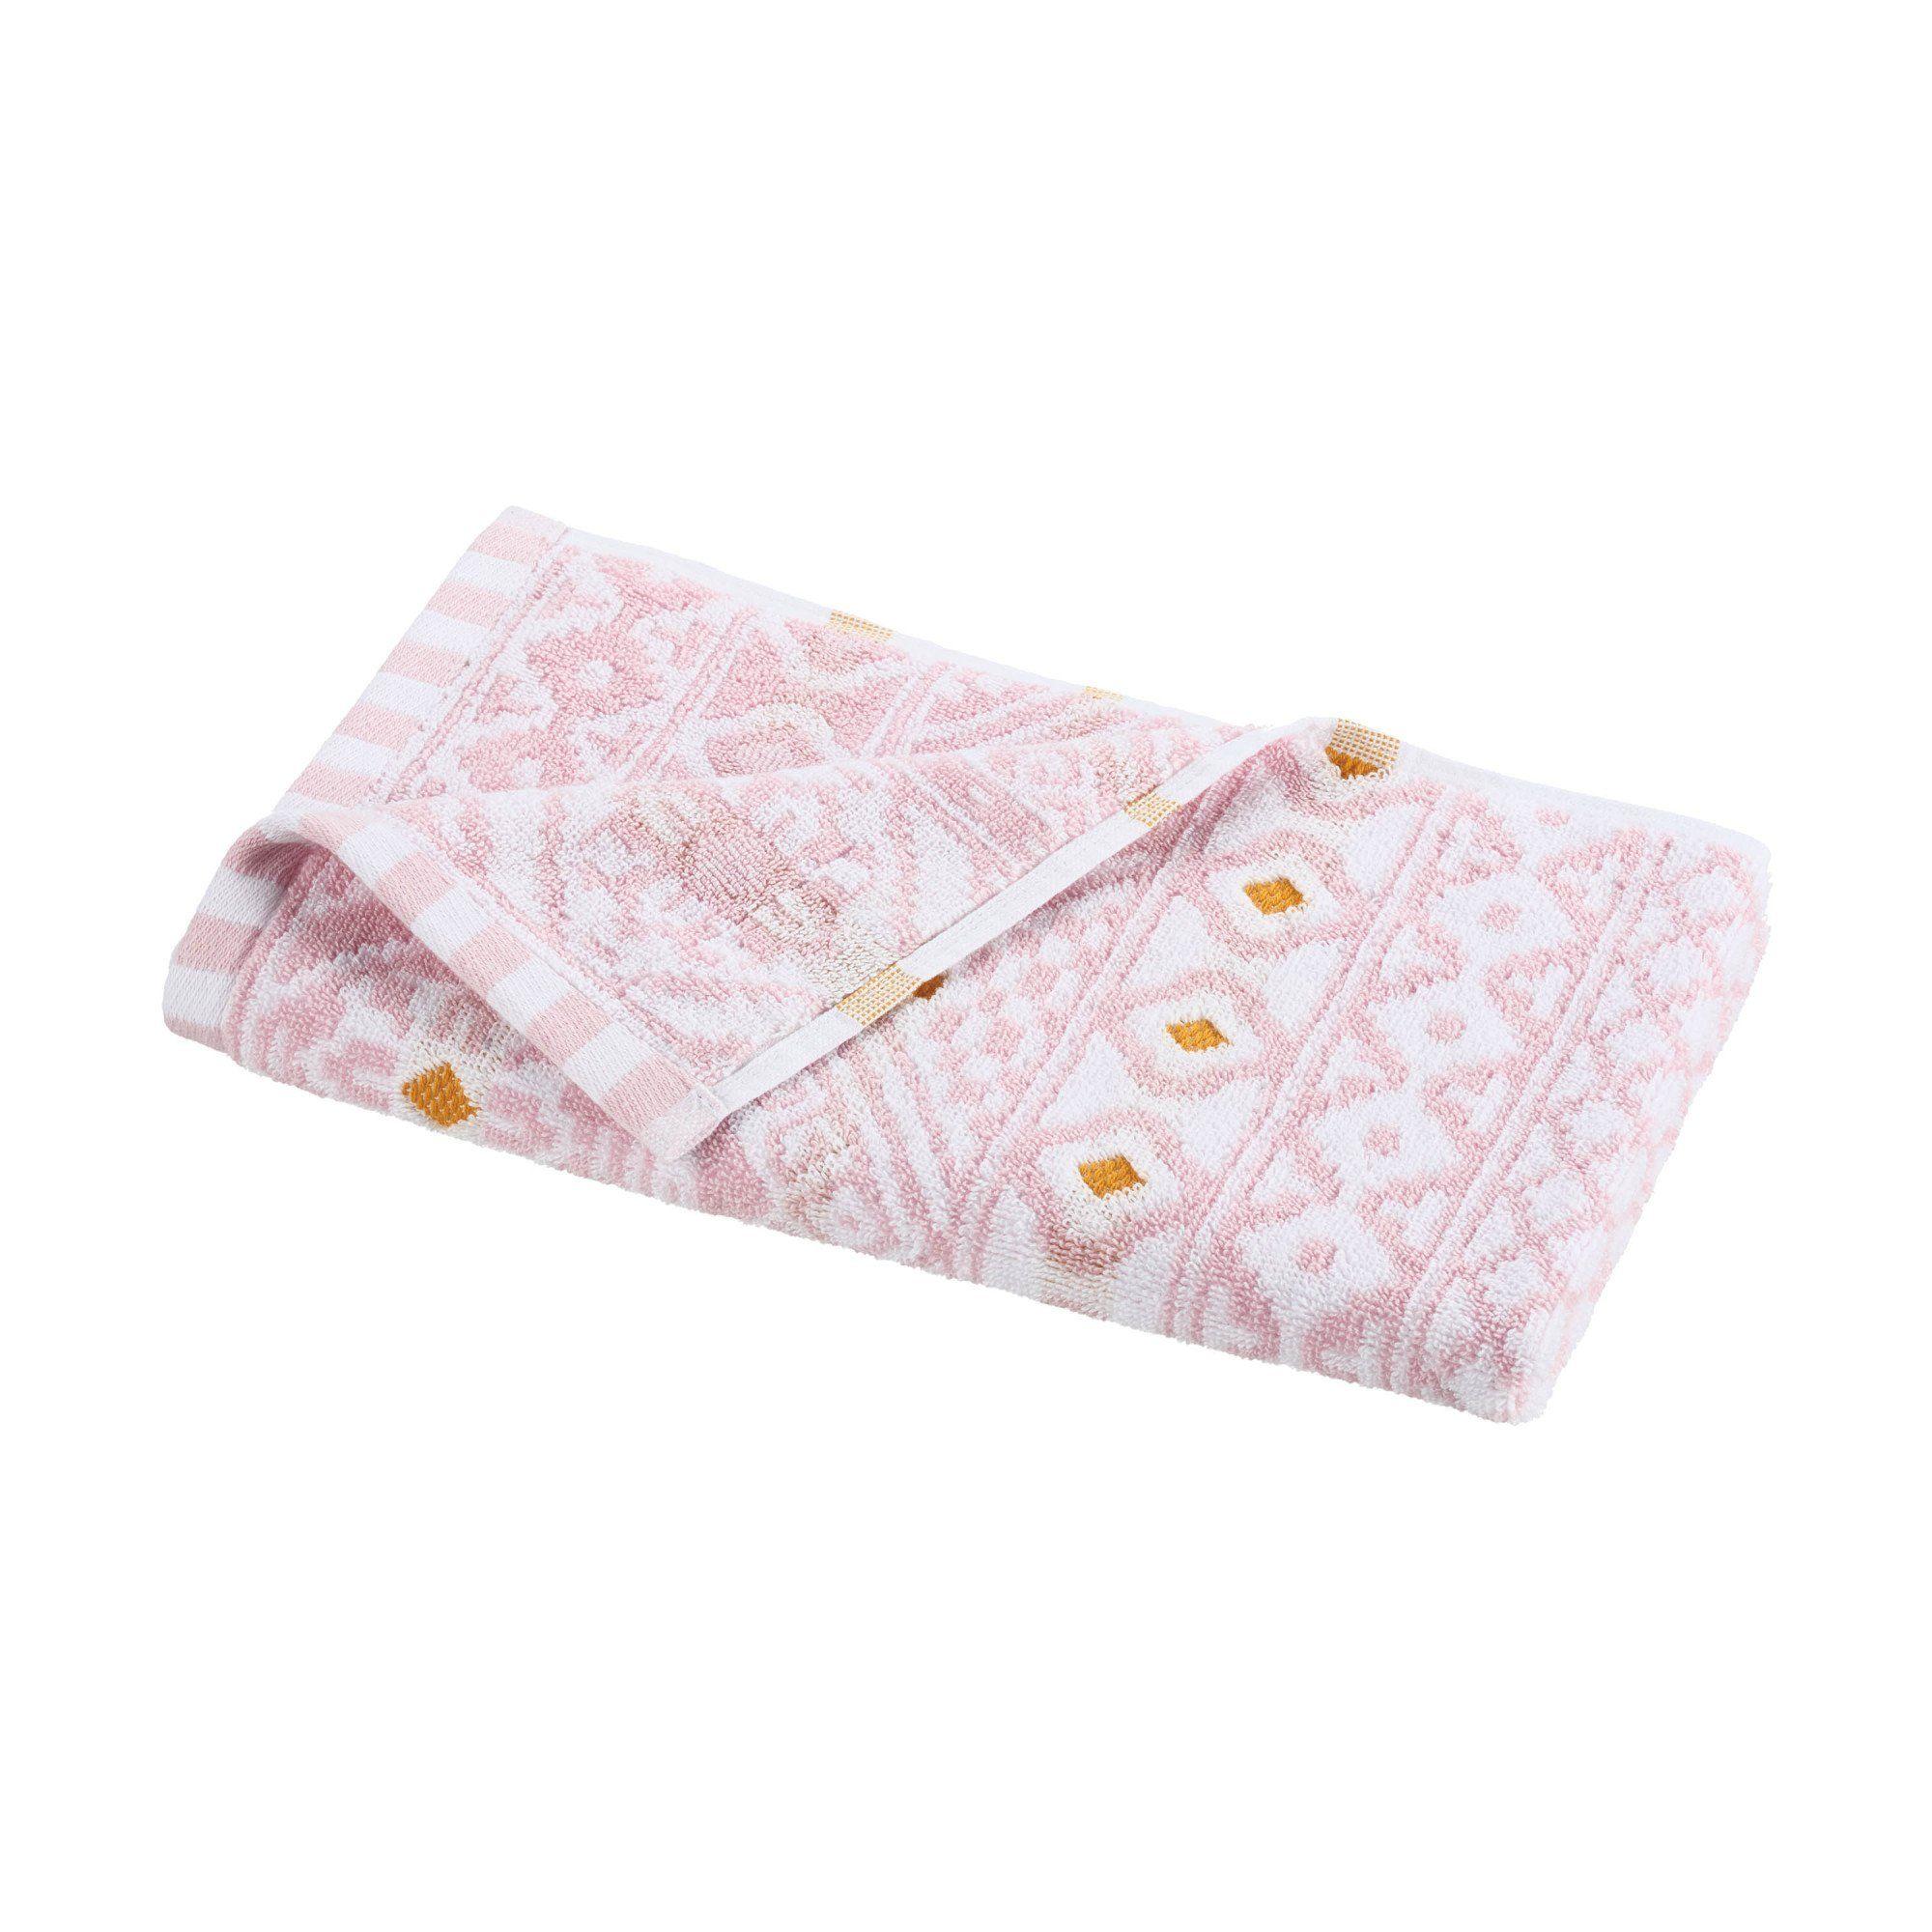 Photo of Martex Pinkadinkadew Jacquard Bath Towel Collection – Hand / Jeannie